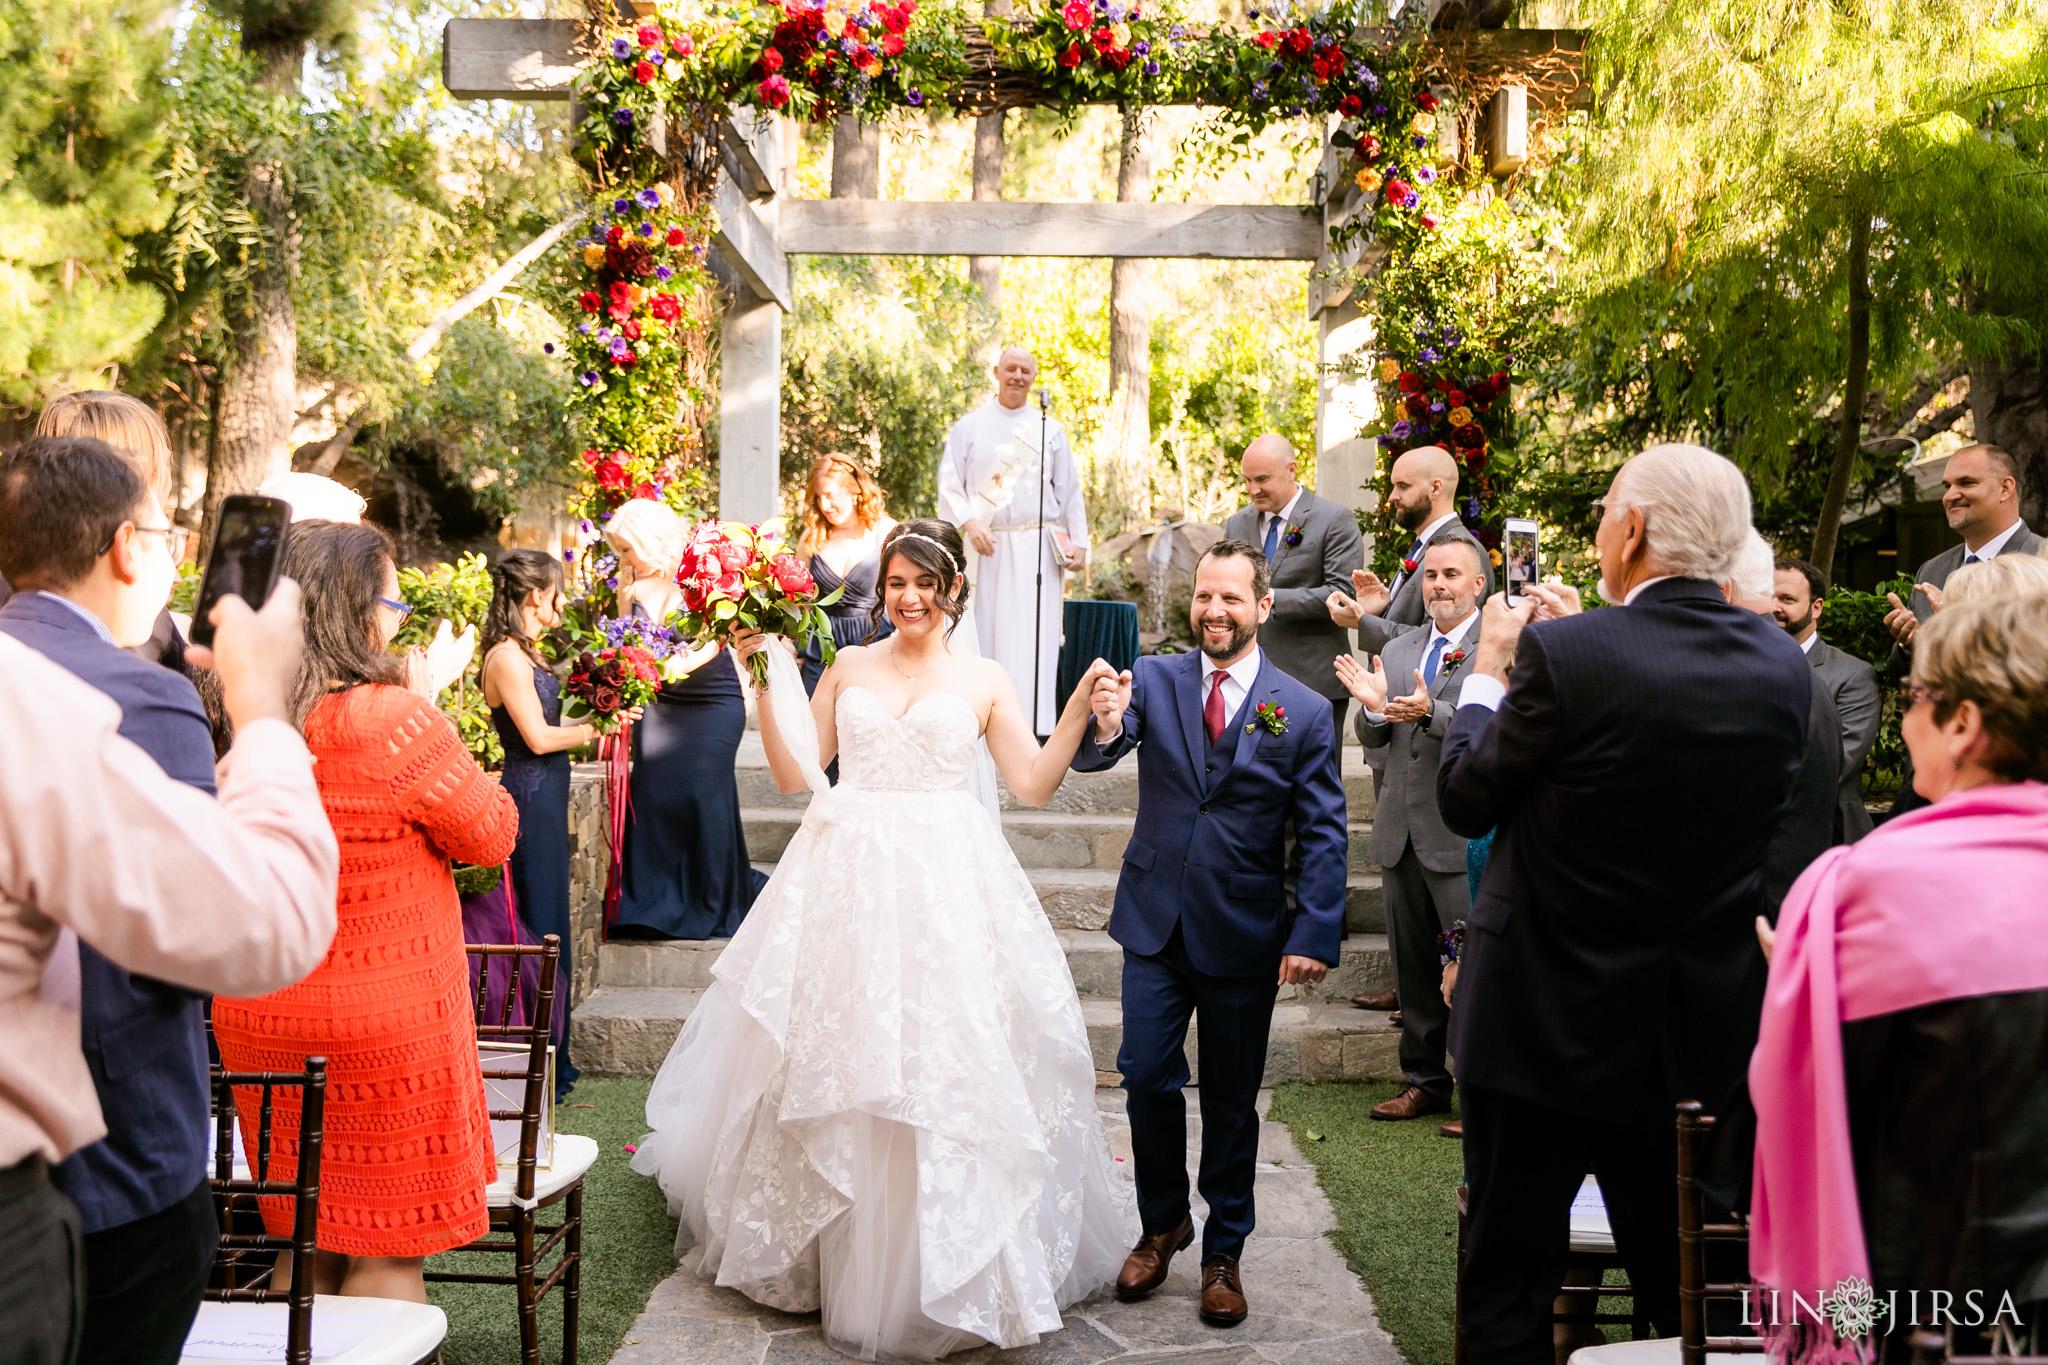 21 Calamigos Rancho Malibu Wedding Photography